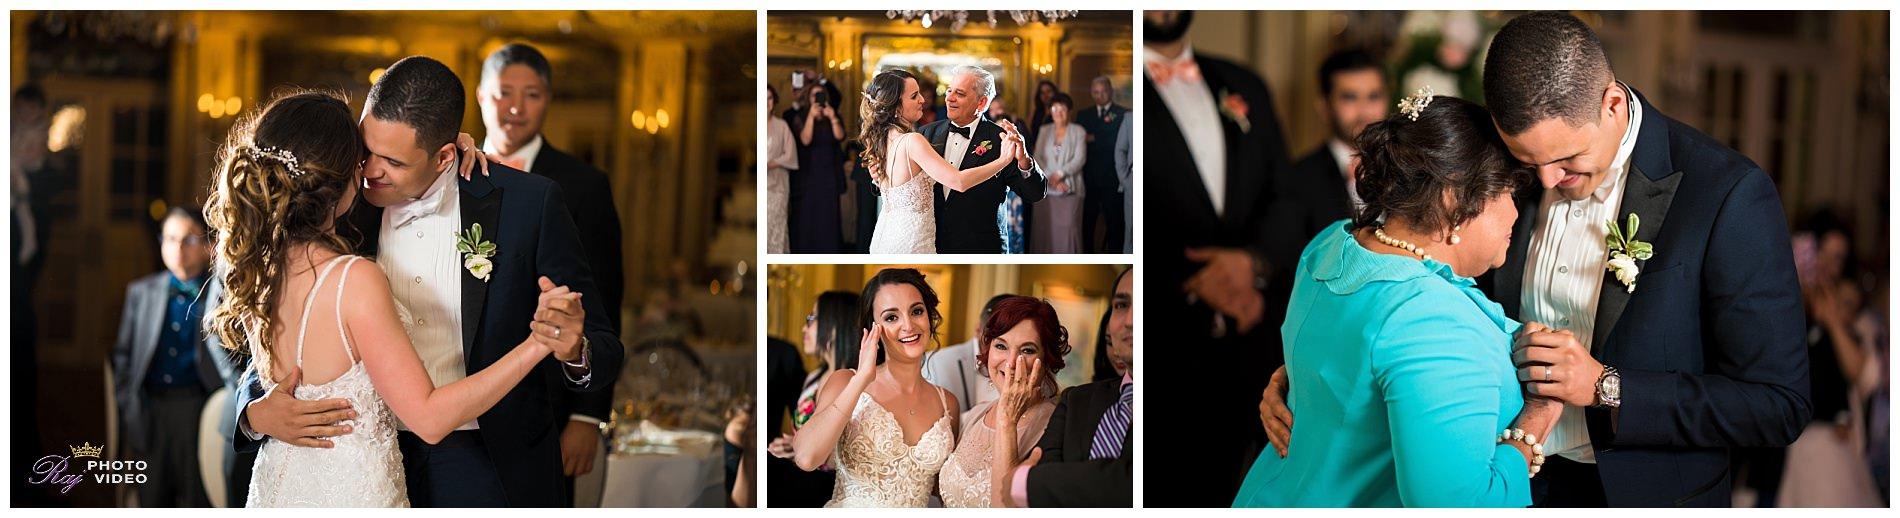 The-Manor-West-Orange-NJ-Wedding-Reception-Yanet-Jose-17.jpg